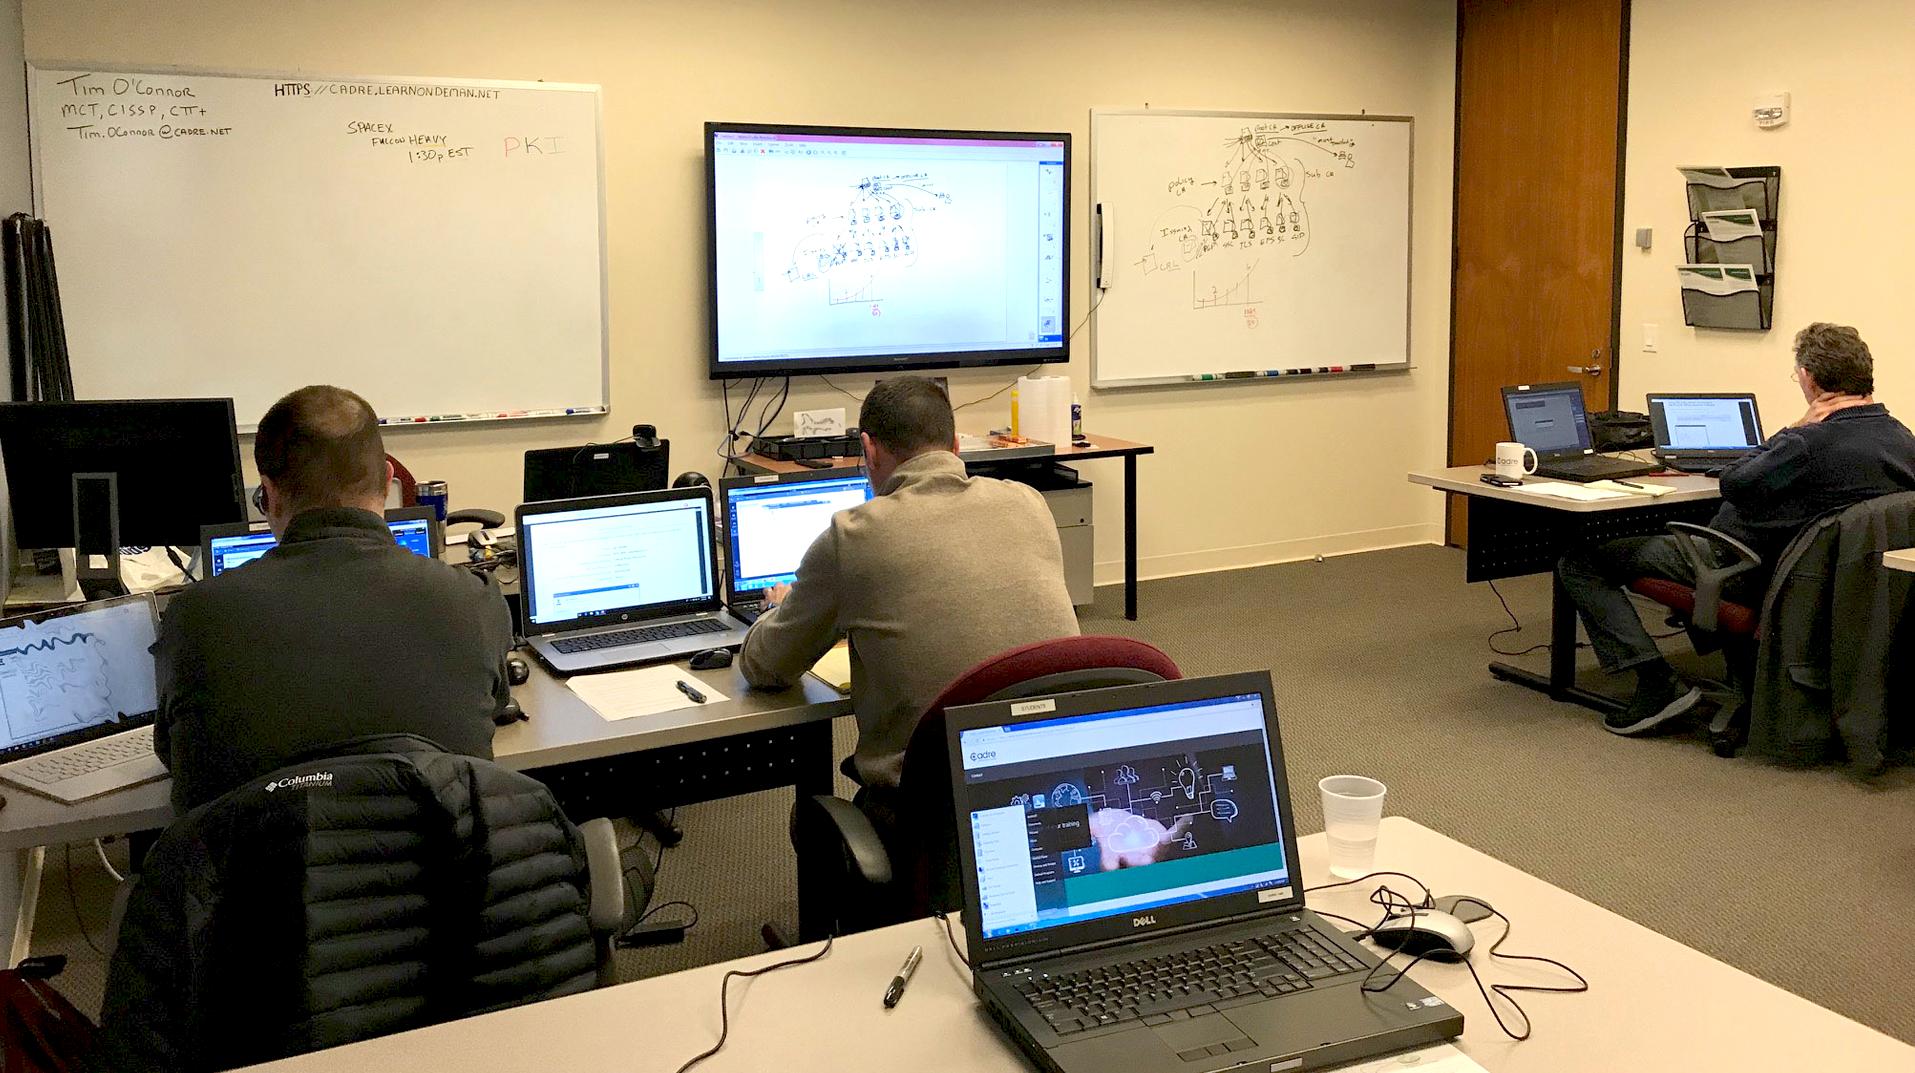 Modern Day Classroom2